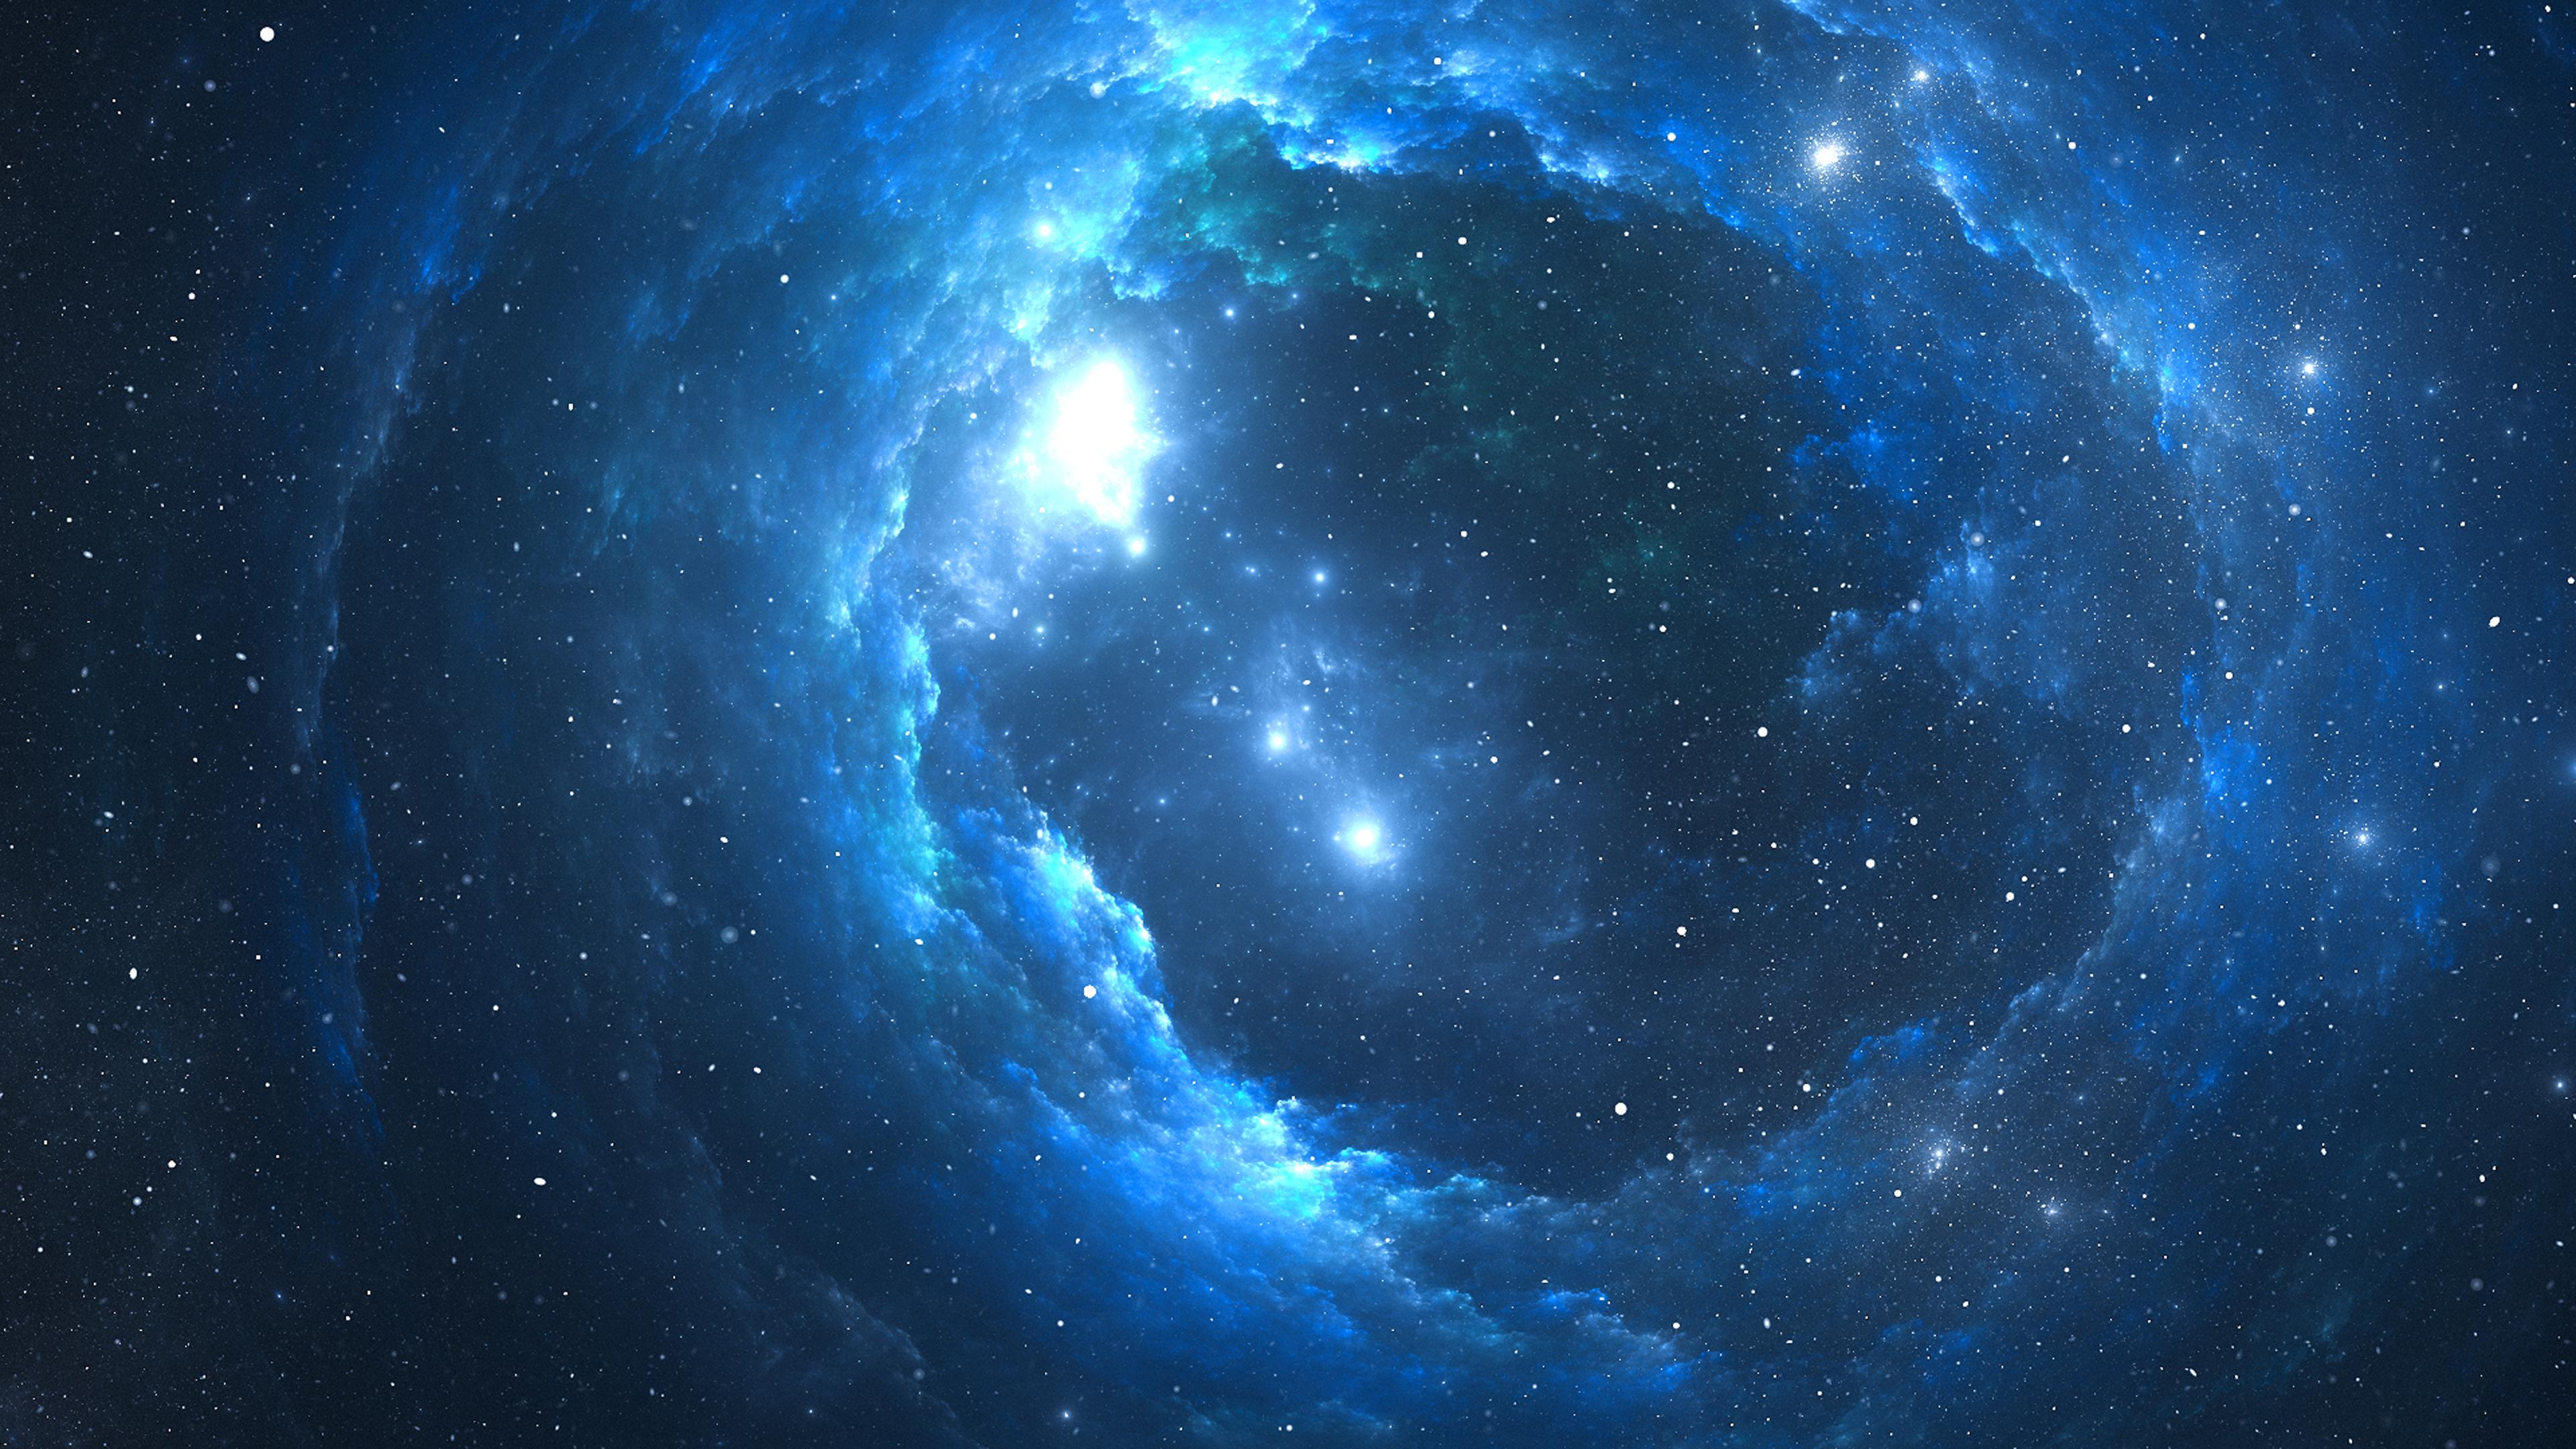 sky blue nebula 1579380719 - Sky Blue Nebula - Sky Blue Nebula wallpapers, Sky Blue Nebula 4k wallpapers, Nebula wallpapers 4k, nebula 4k wallpapers